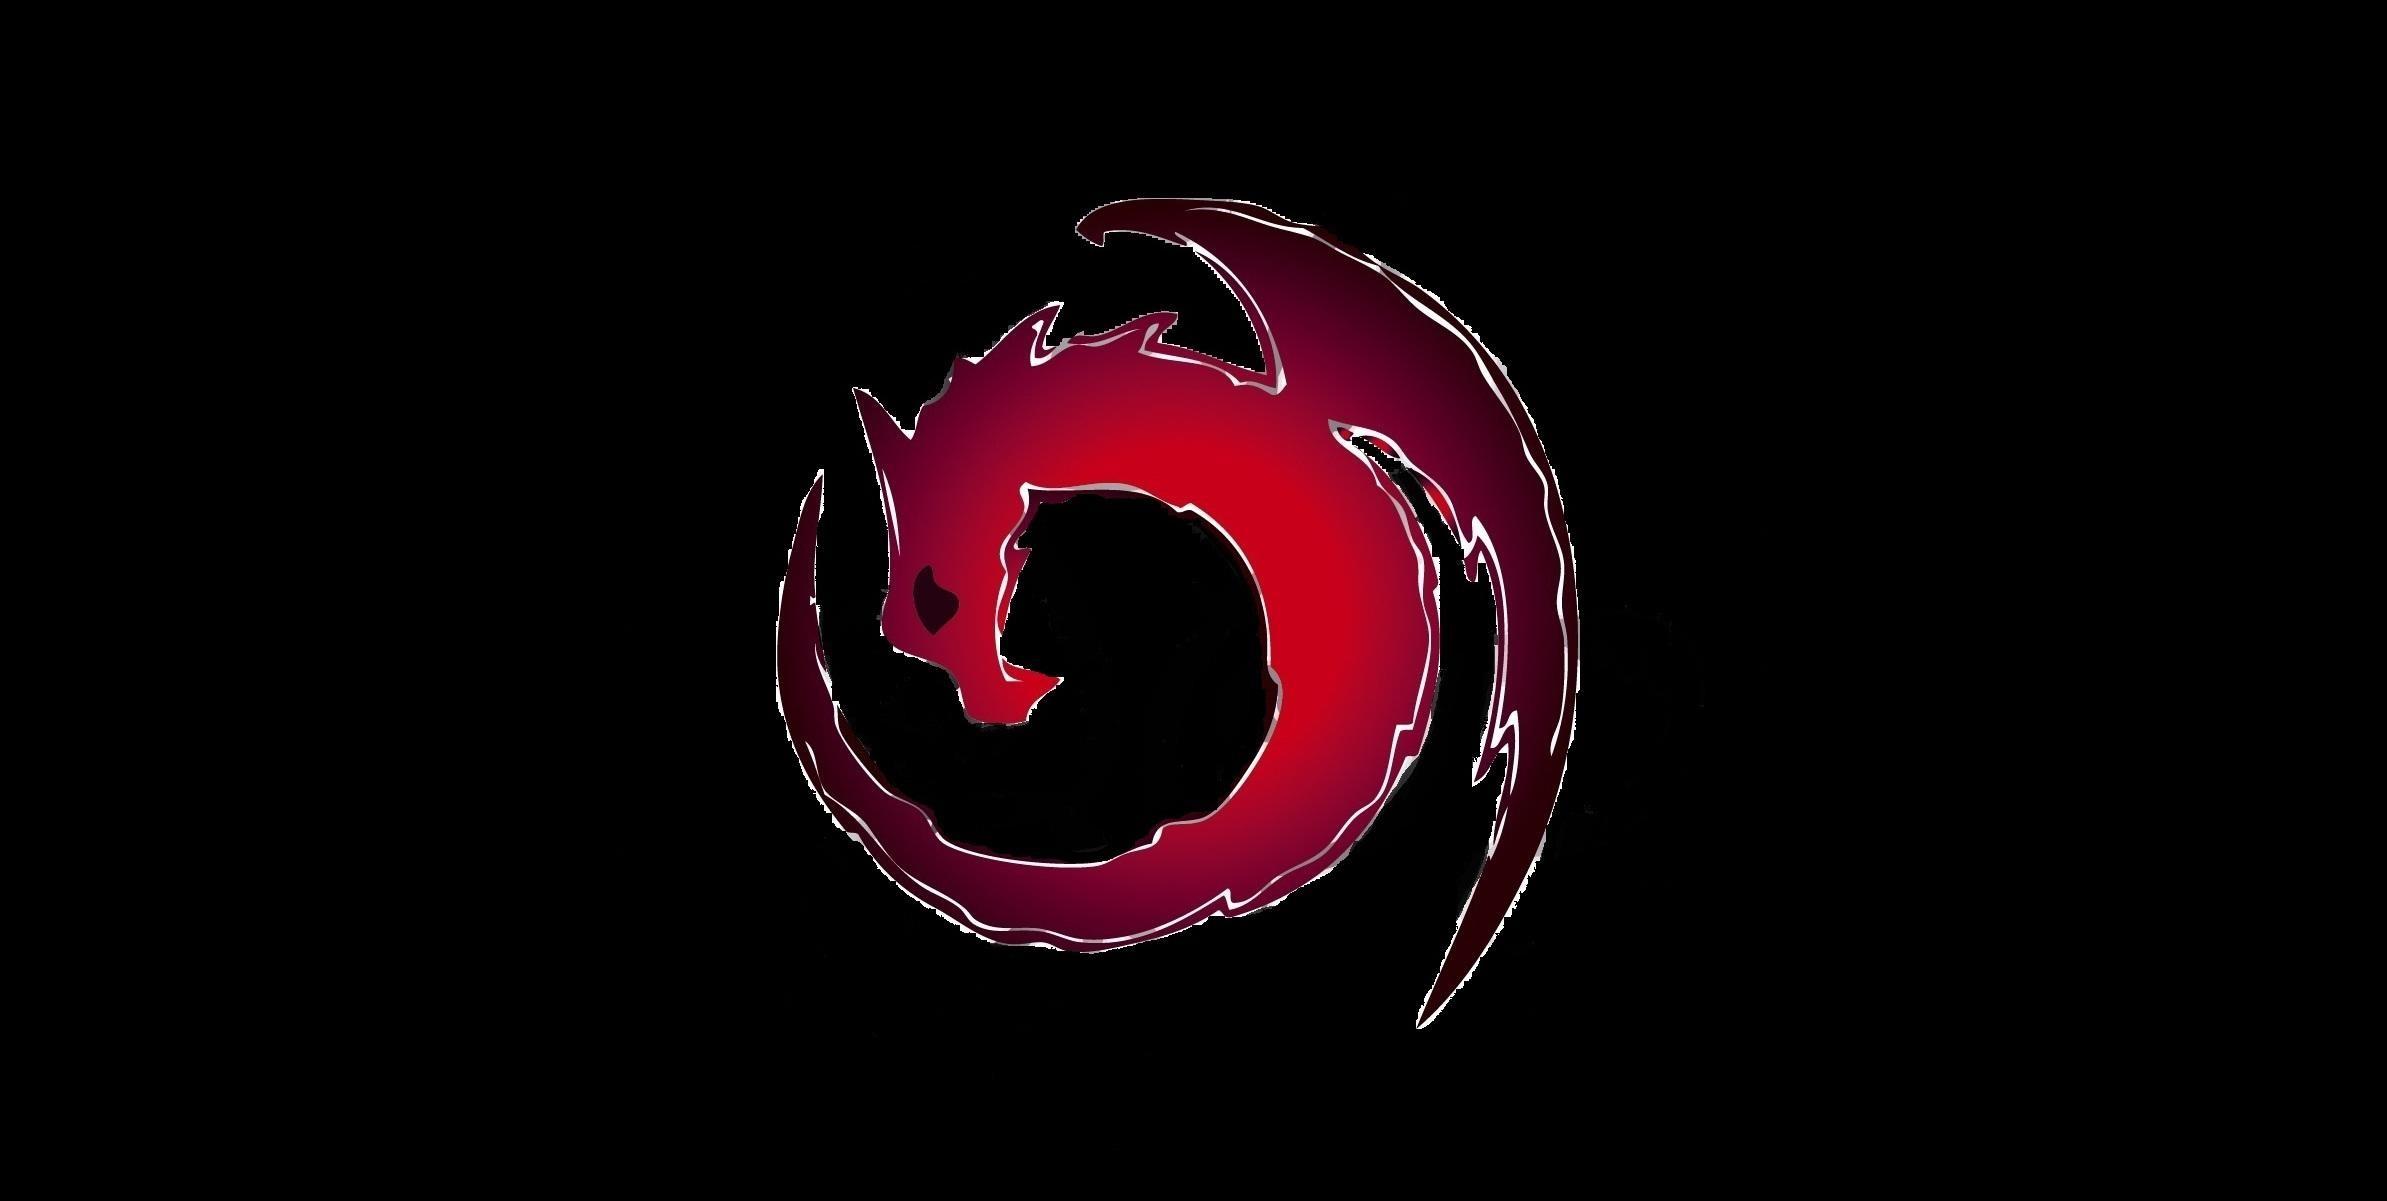 Red Dragon wallpaper thumb